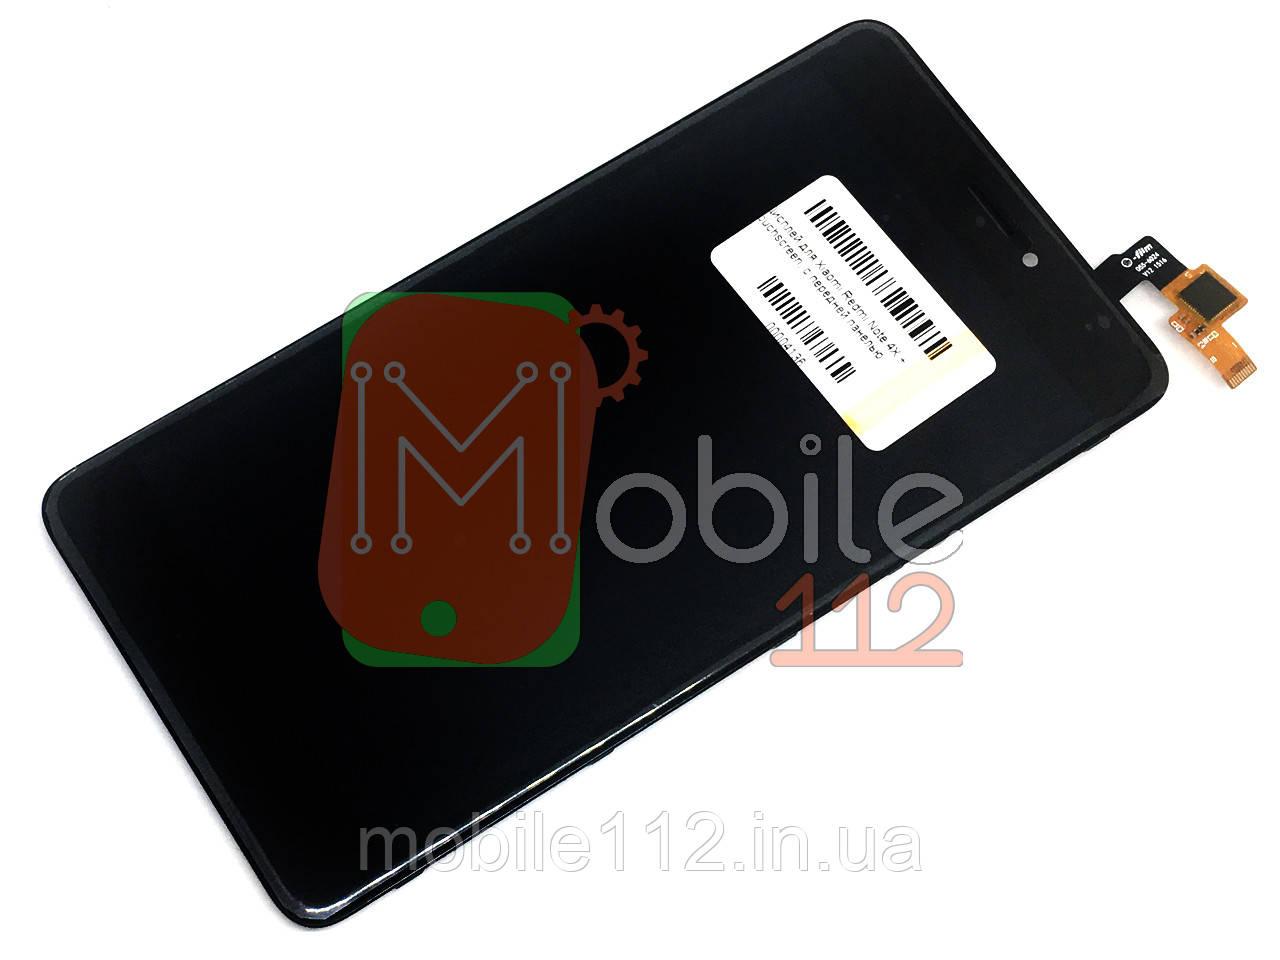 Экран (дисплей) Xiaomi Redmi Note 4X, Note 4 Global 3/32 2016102 + тачскрин черный